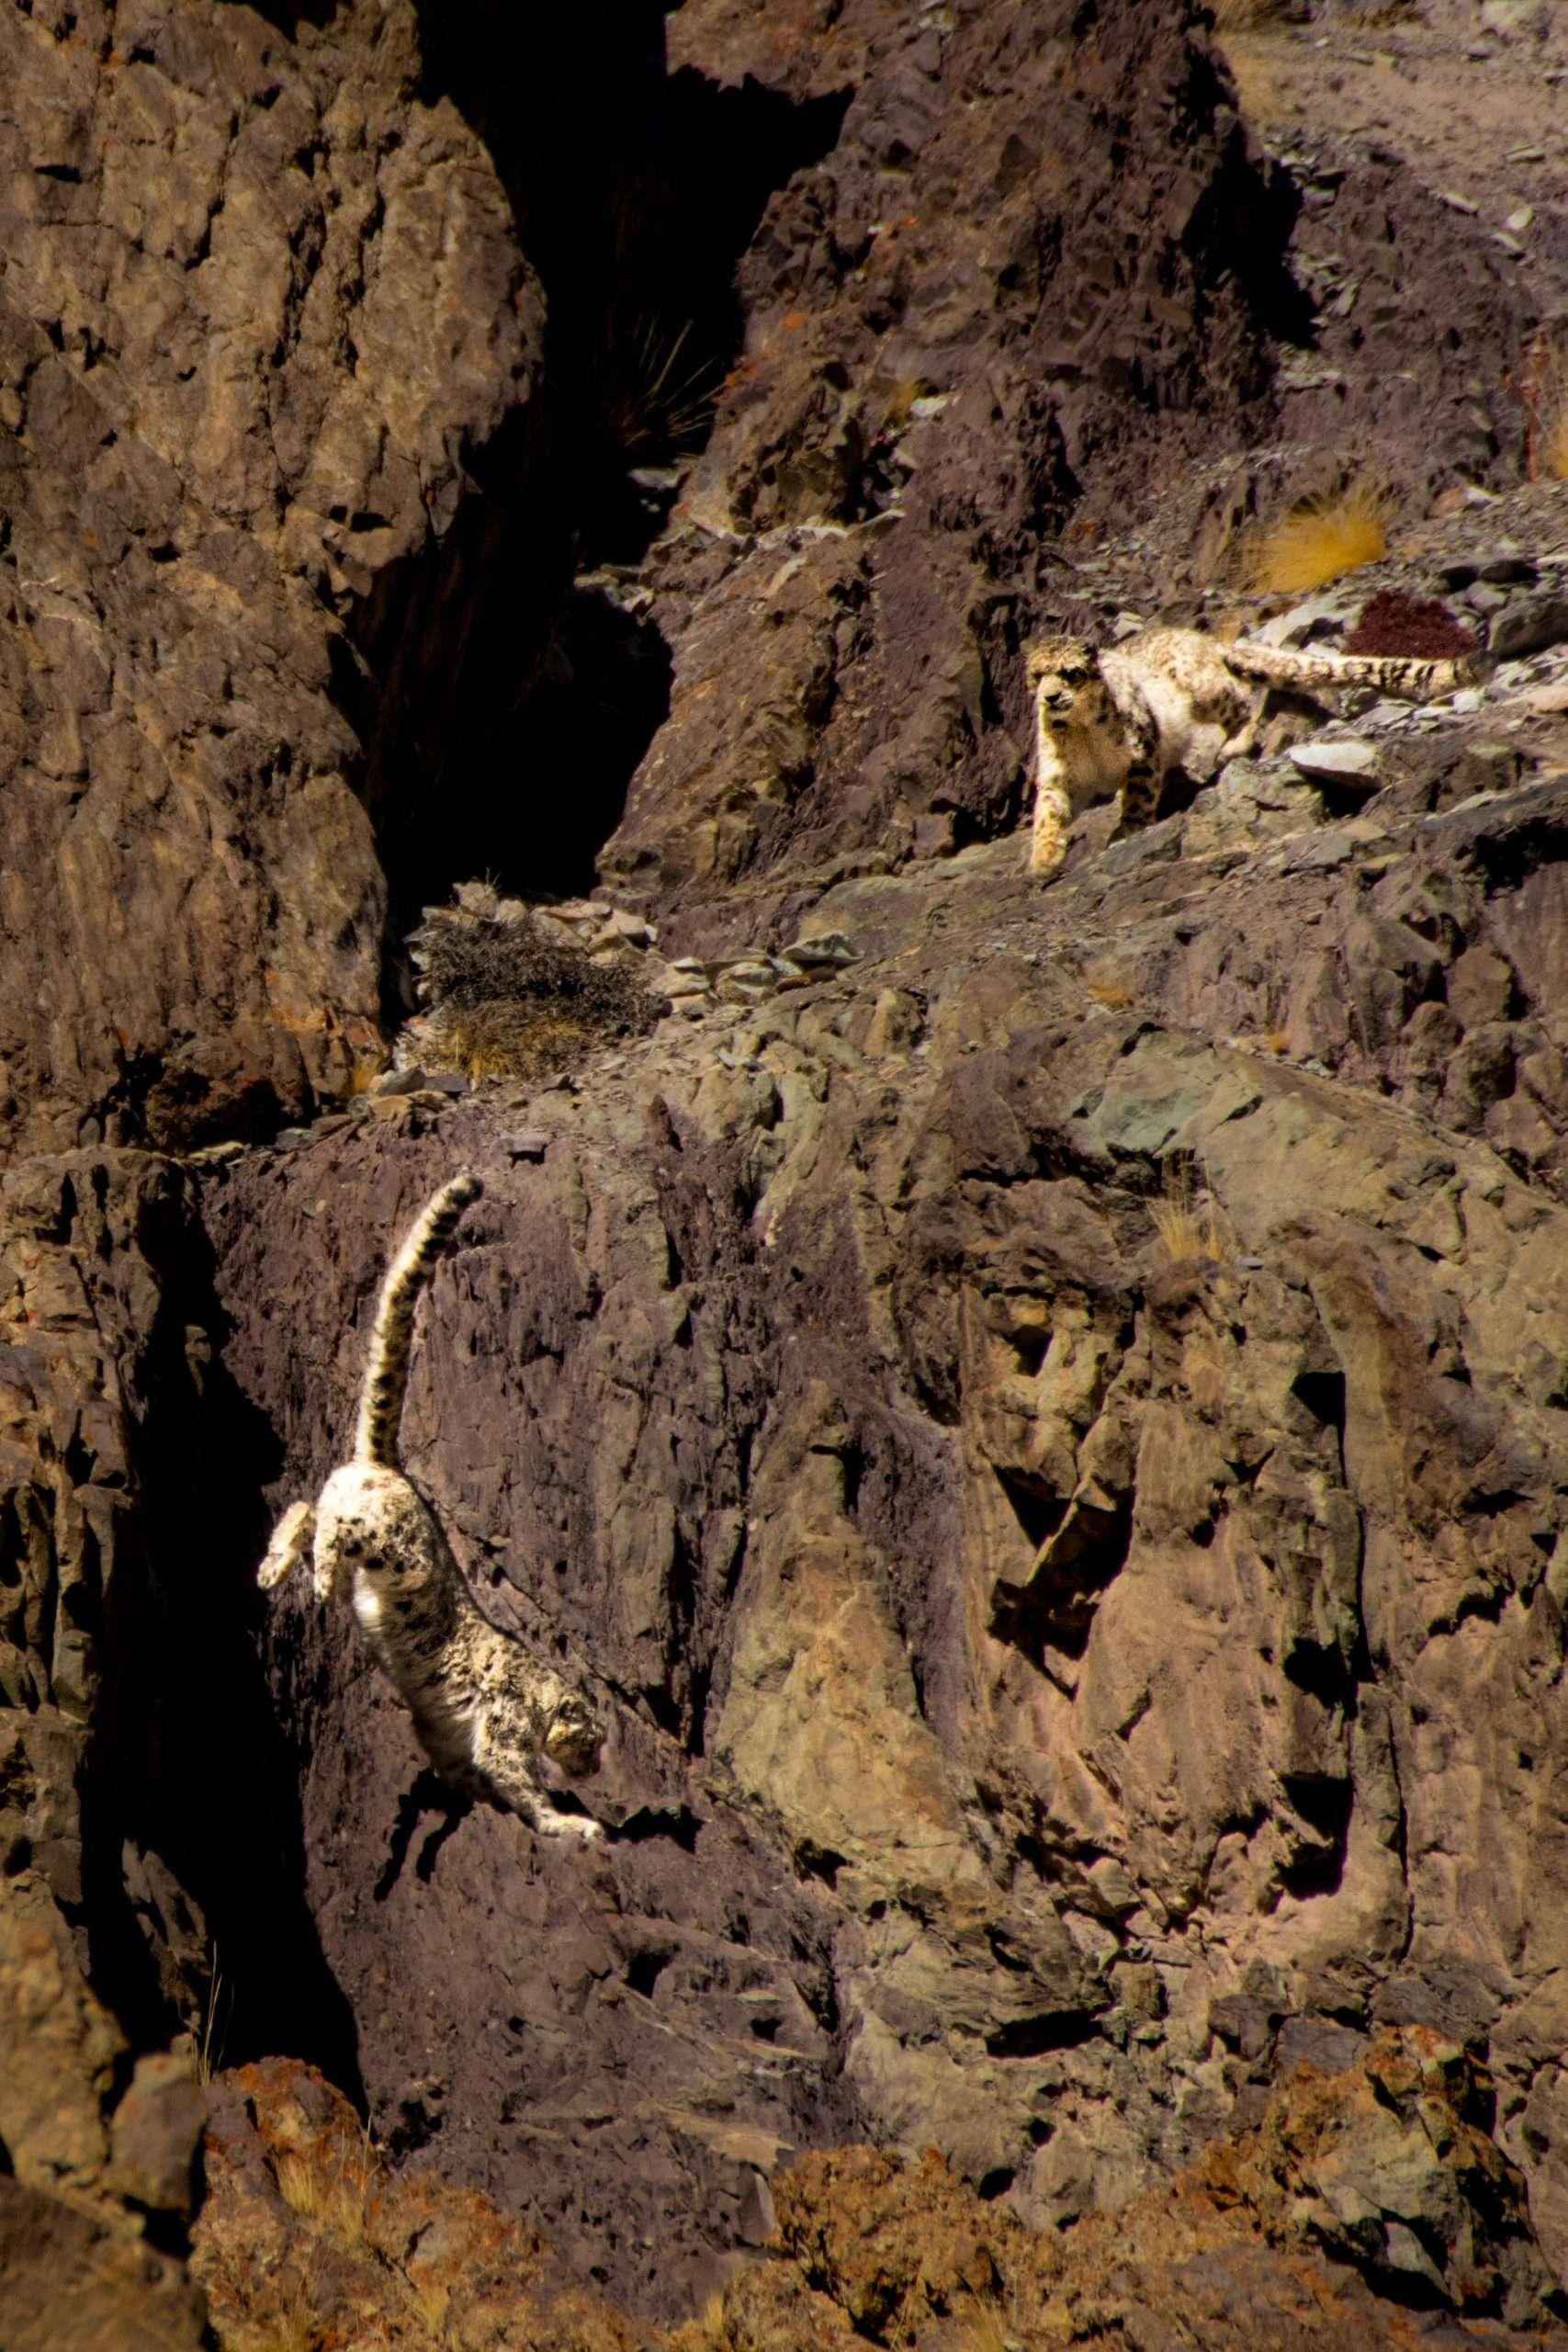 Snow Leopards In Hemis National Park